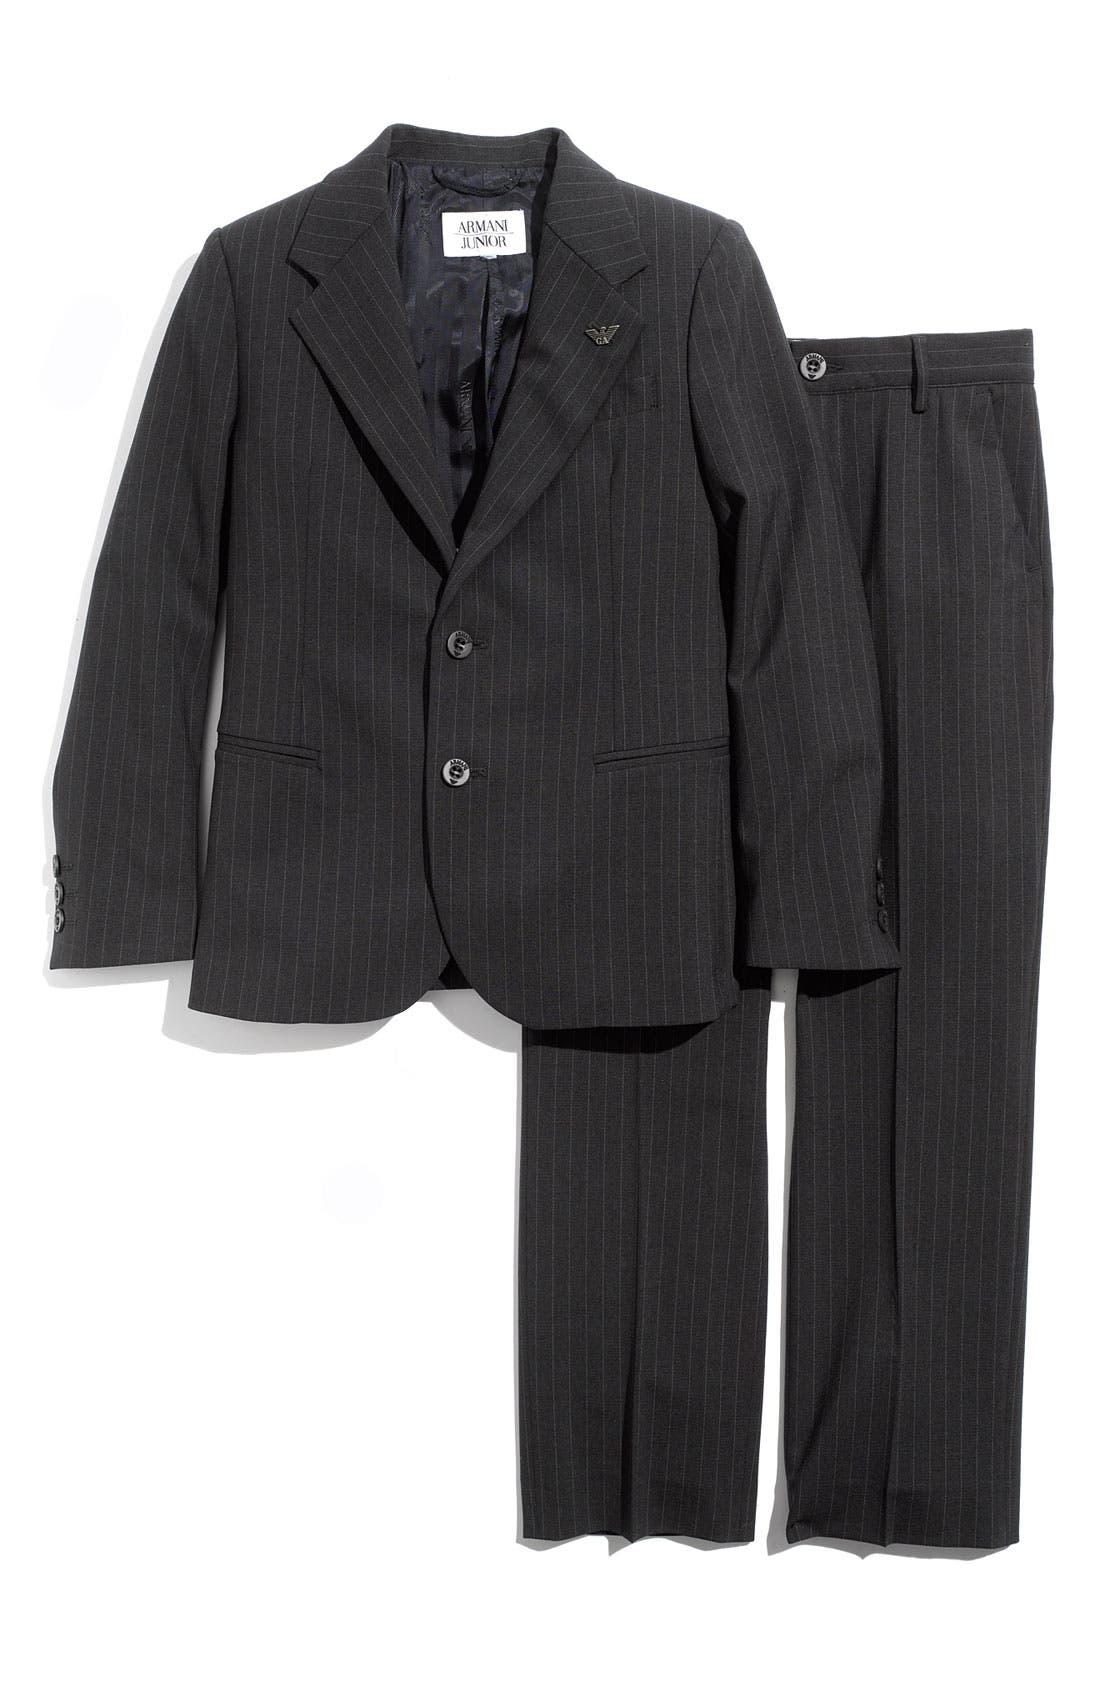 Alternate Image 1 Selected - Armani Junior Two Piece Suit (Big Boys)